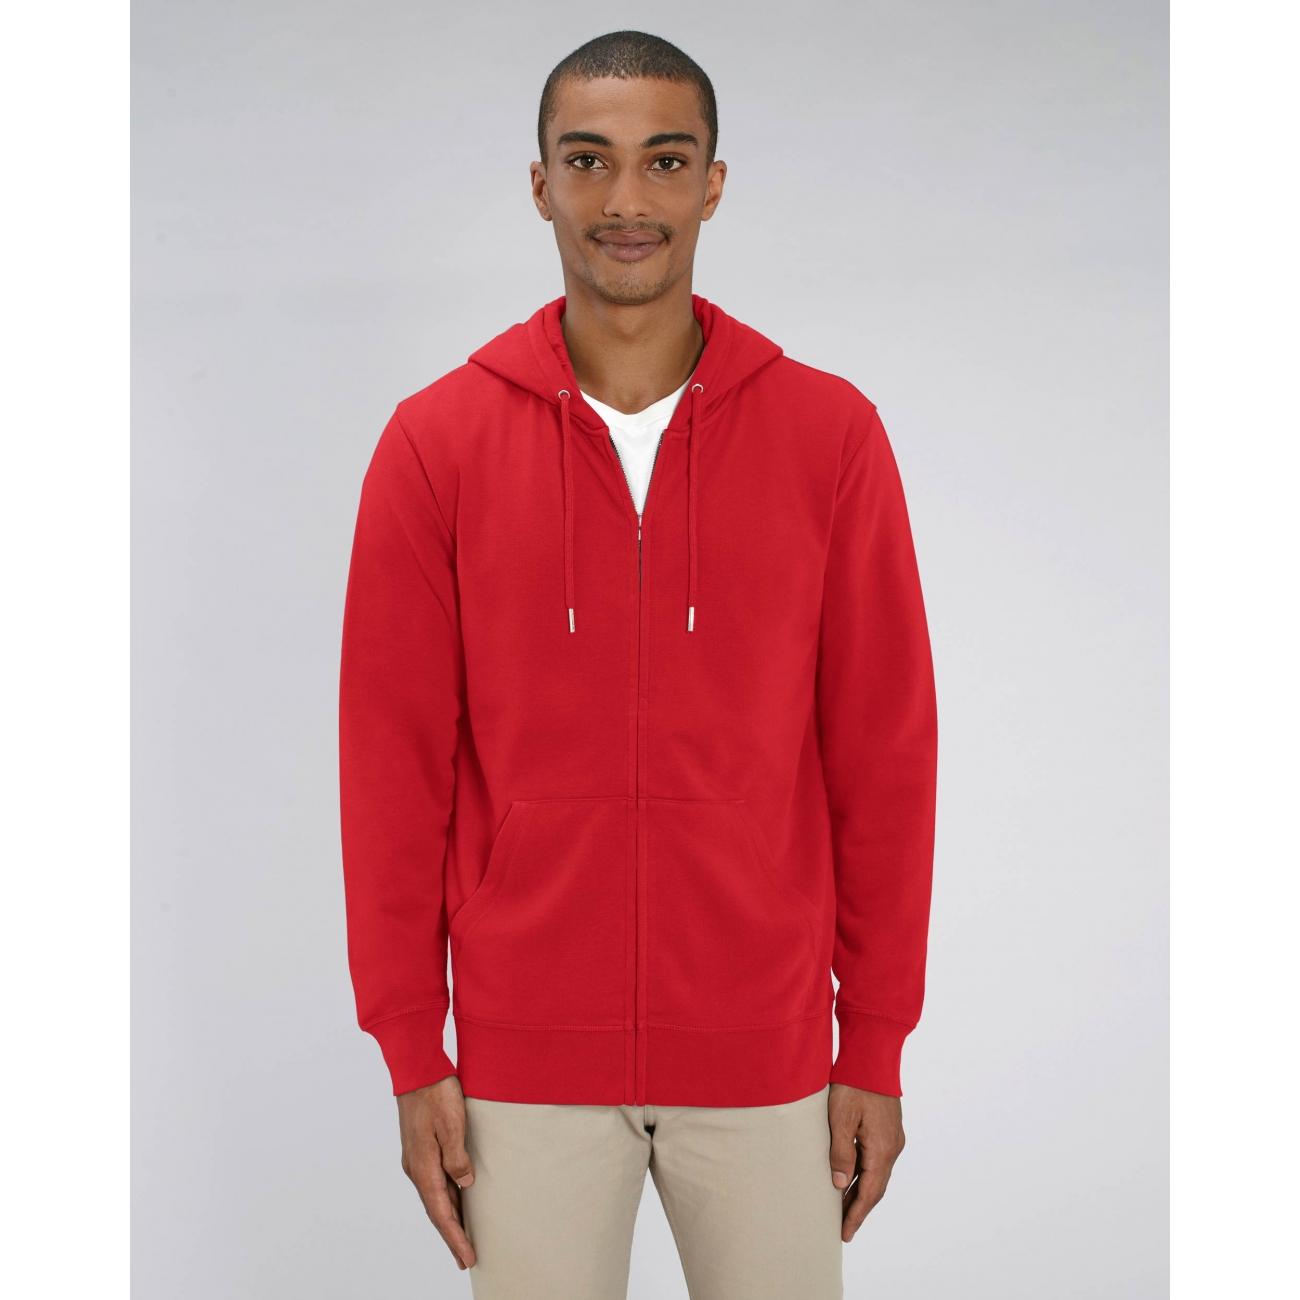 https://tee-shirt-bio.com/8273-thickbox_default/veste-capuche-zippee-coton-bio-rouge-legere-connector.jpg